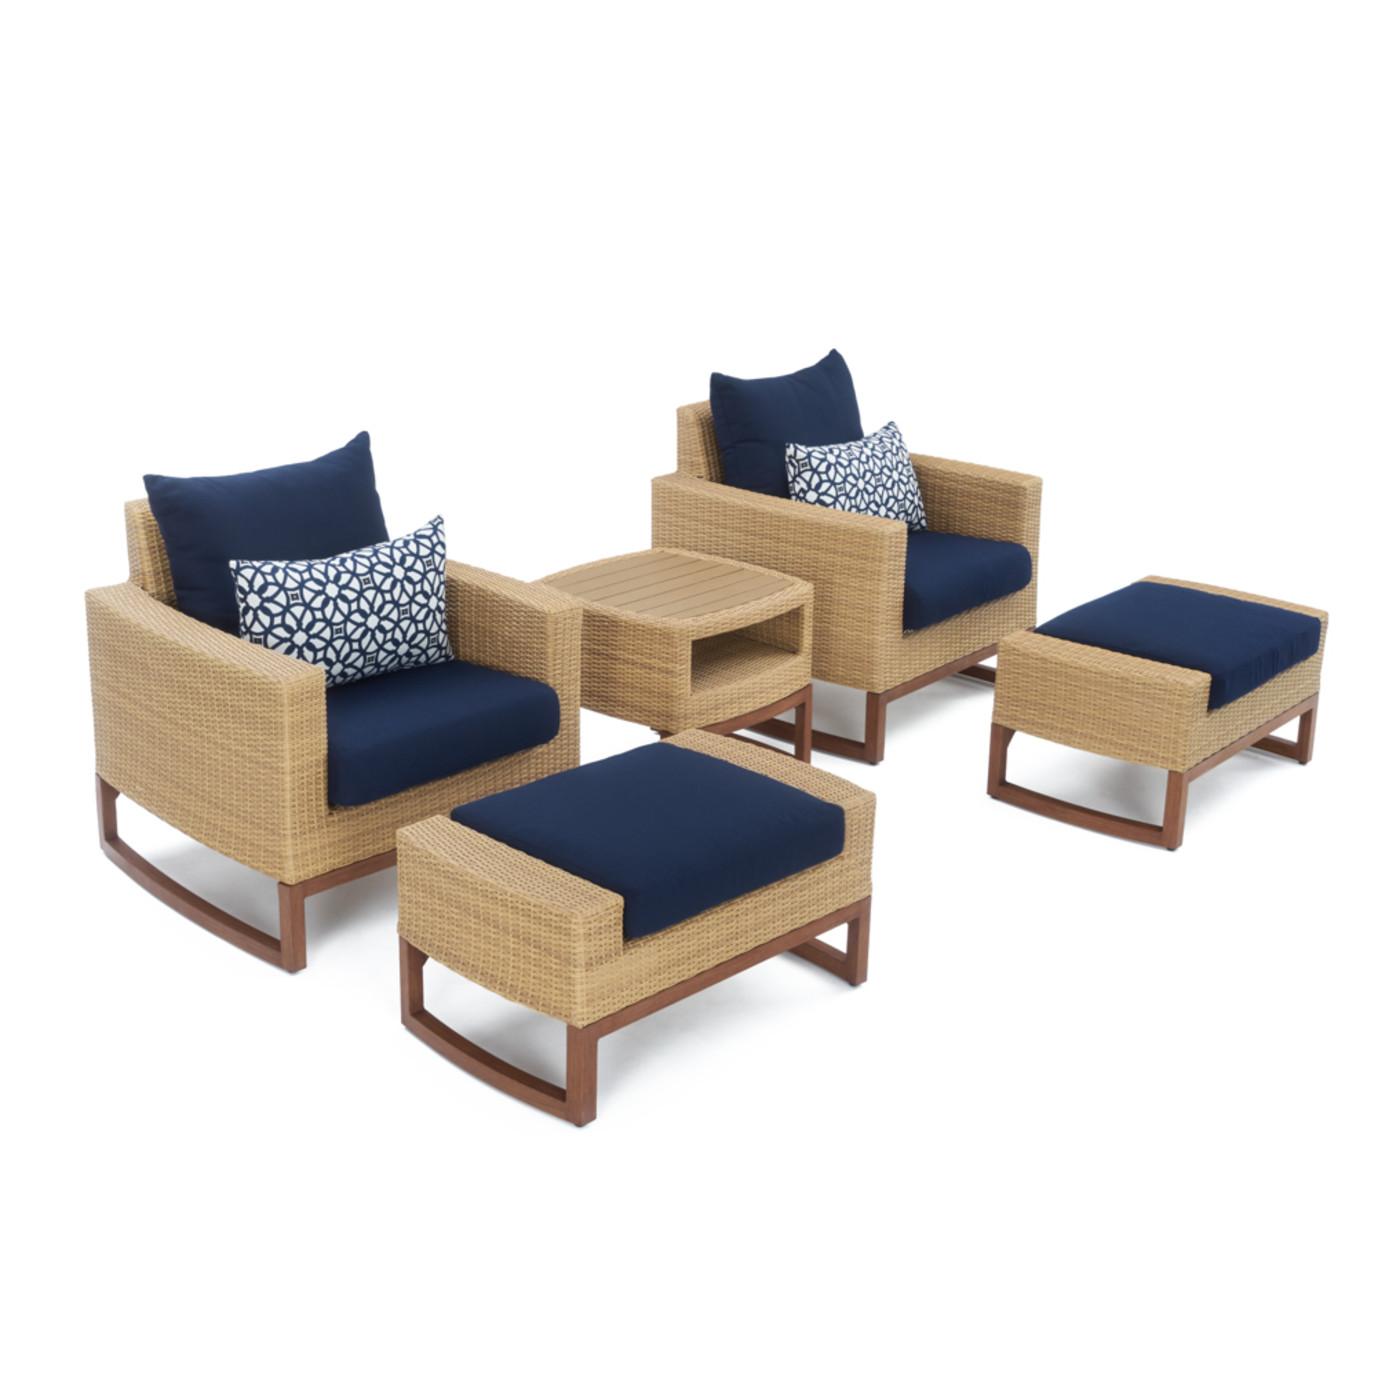 Mili™ 5 Piece Club Chair & Ottoman Set - Navy Blue